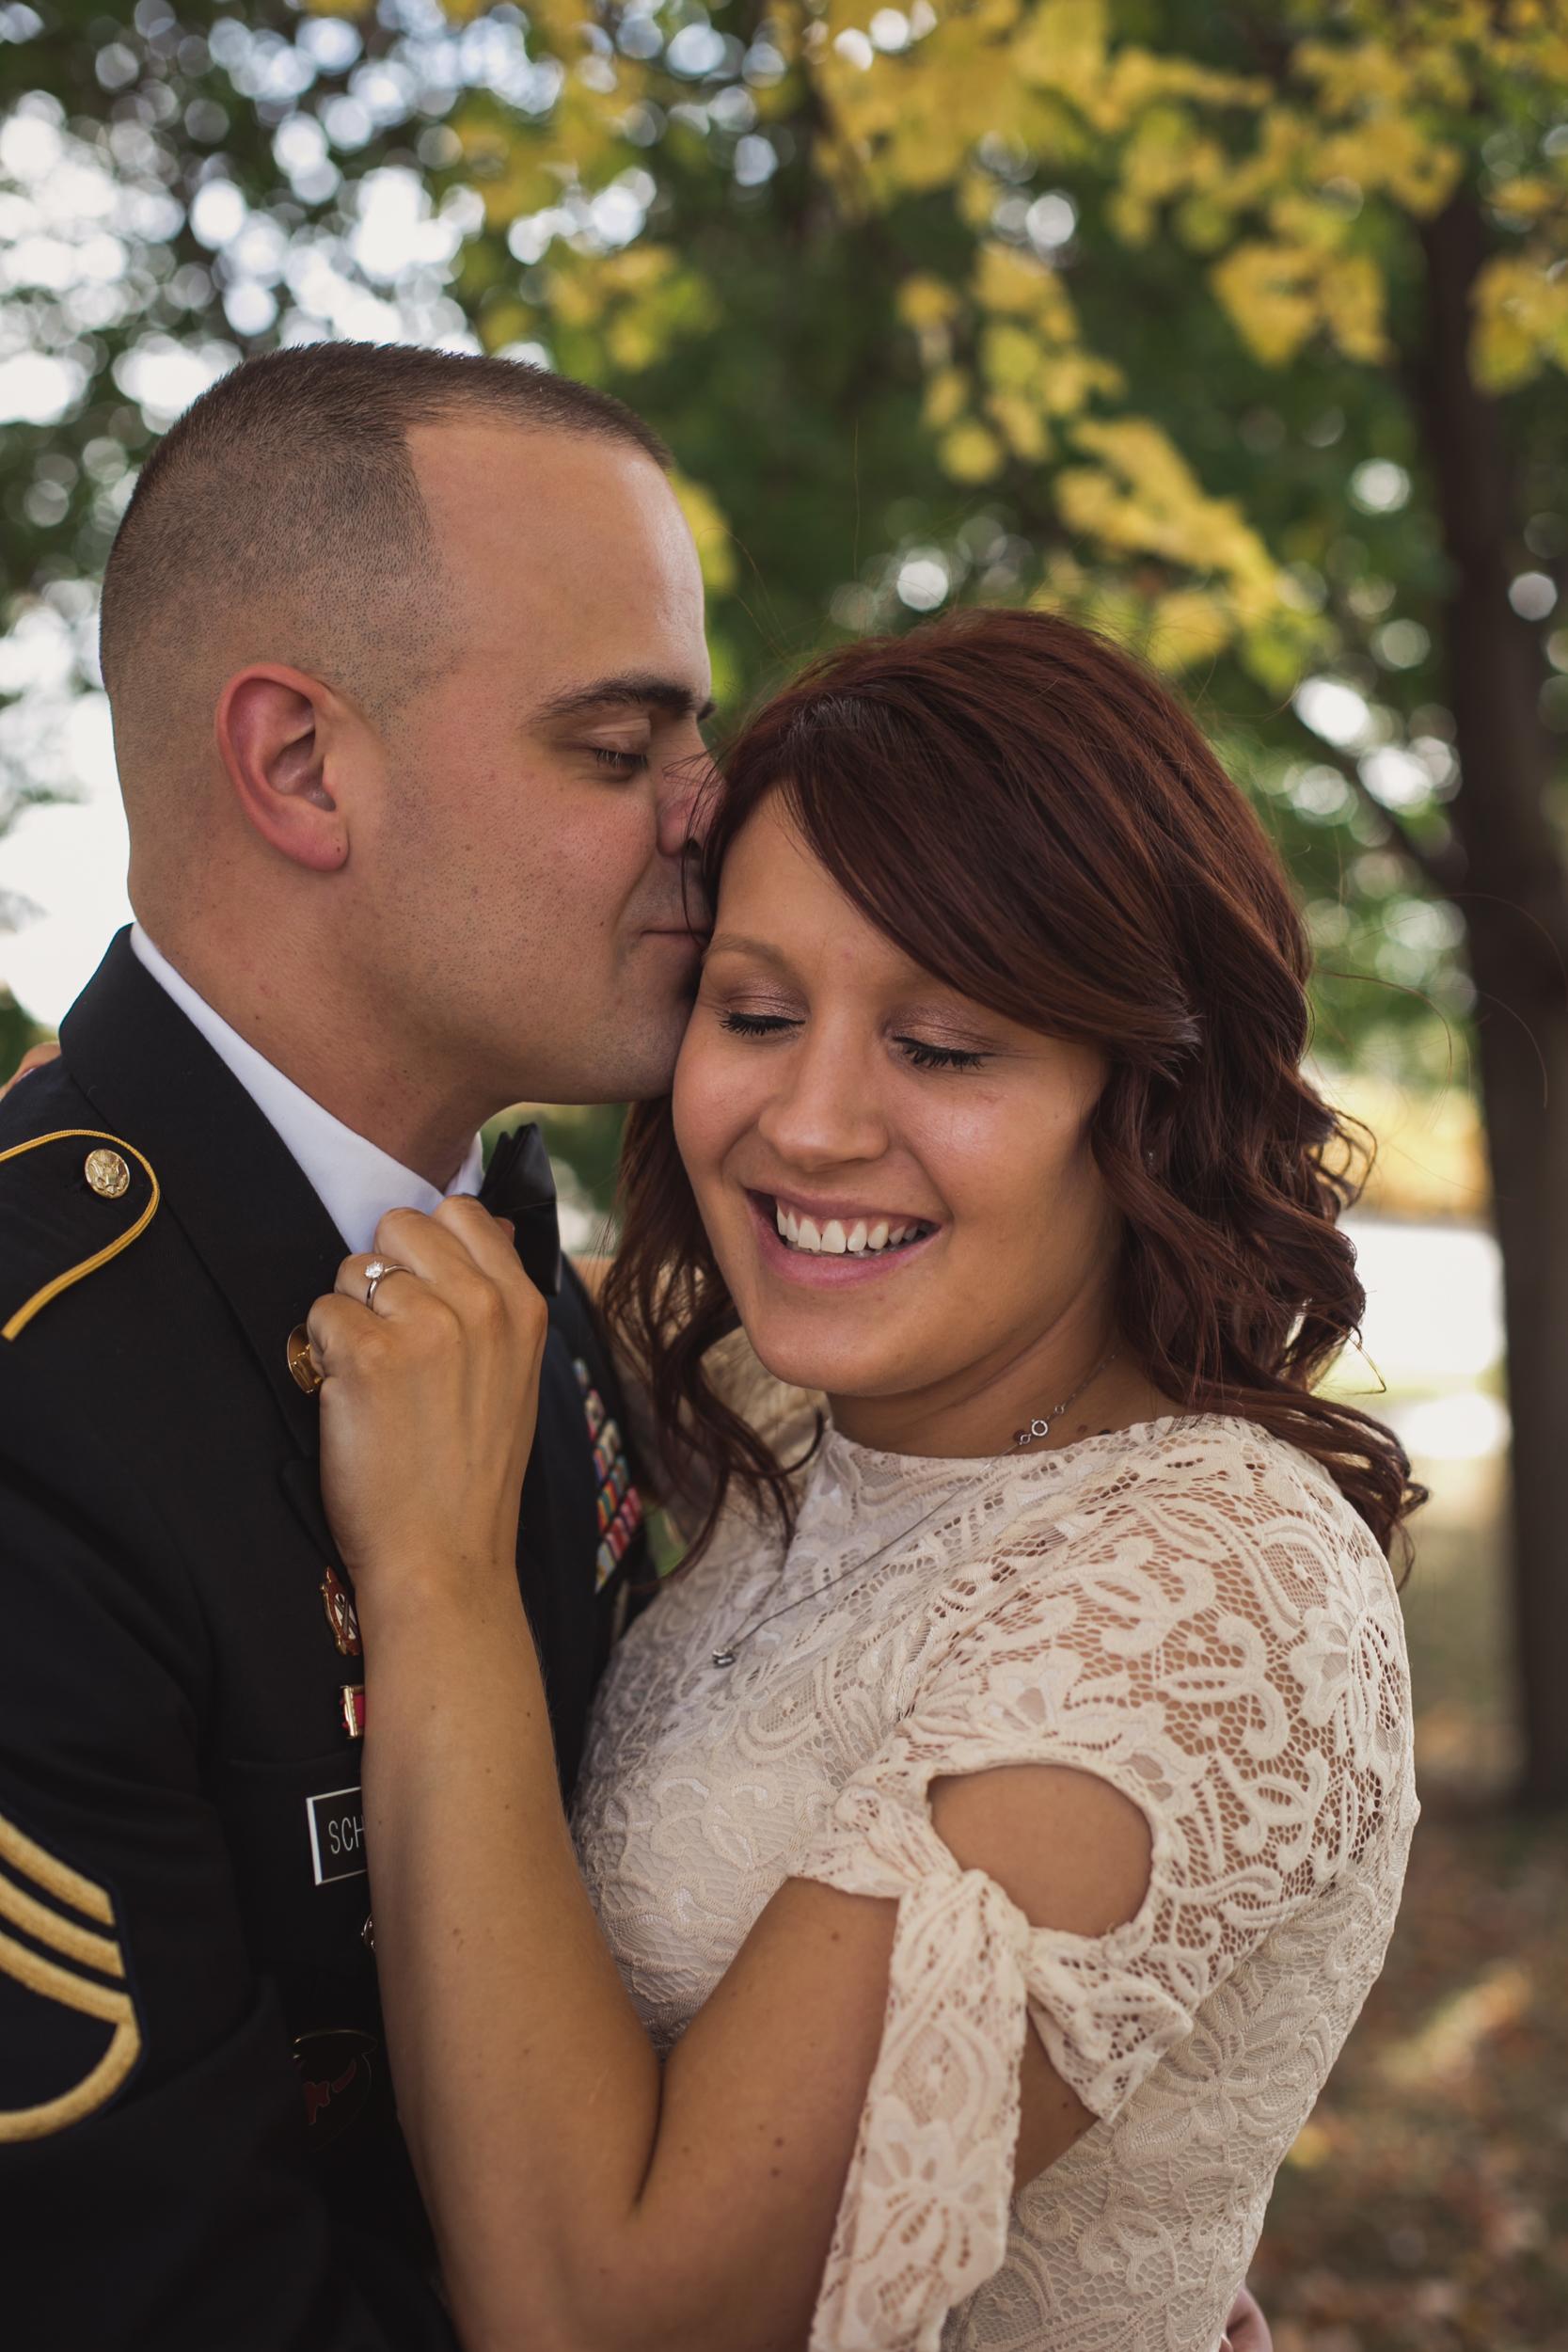 Fort Snelling Elopement St. Paul, MN, Fort Snelling Elopement, Military Elopement, Intimate Military Wedding, intimate elopement wedding-www.rachelsmak.com6.jpg